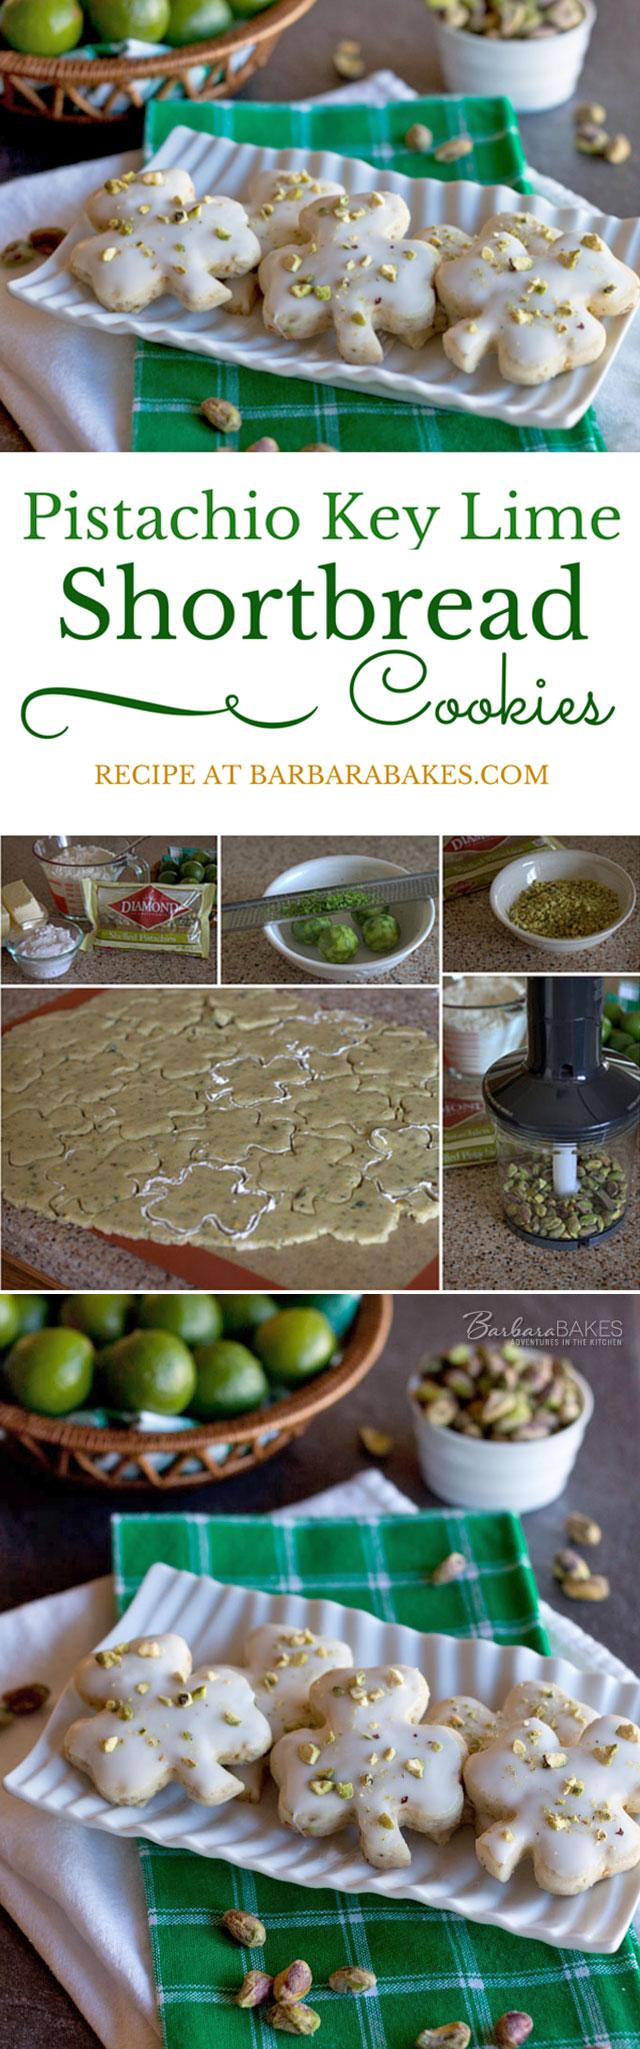 Pistachio Key Lime Shortbread Cookies for St. Patrick's Day